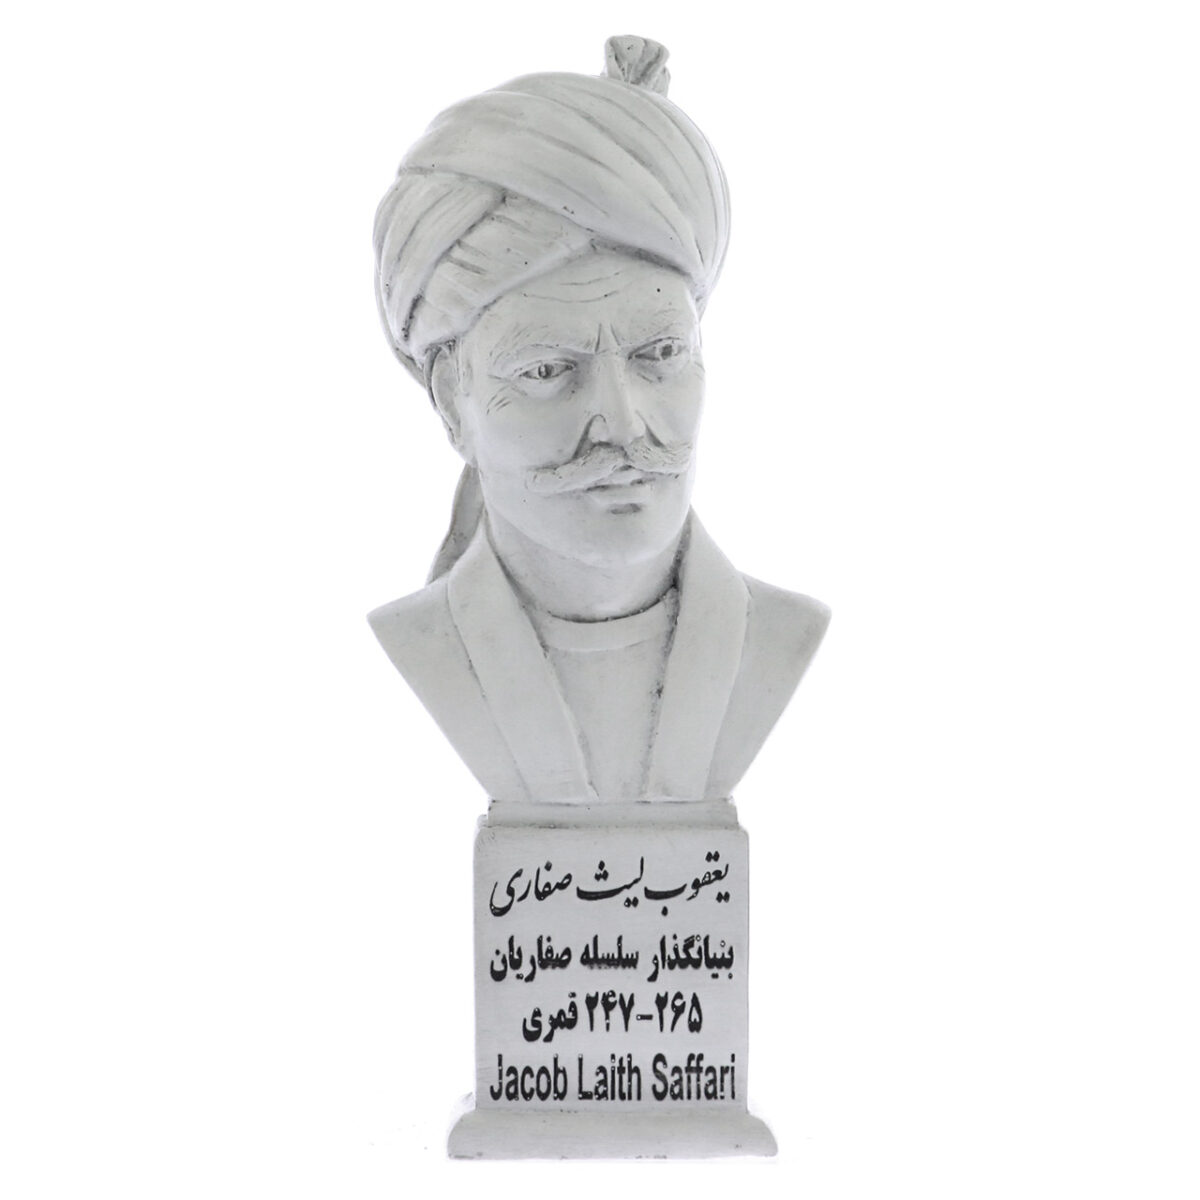 yaghoub leys saffari s 1200x1200 - سردیس یعقوب لیث صفاری